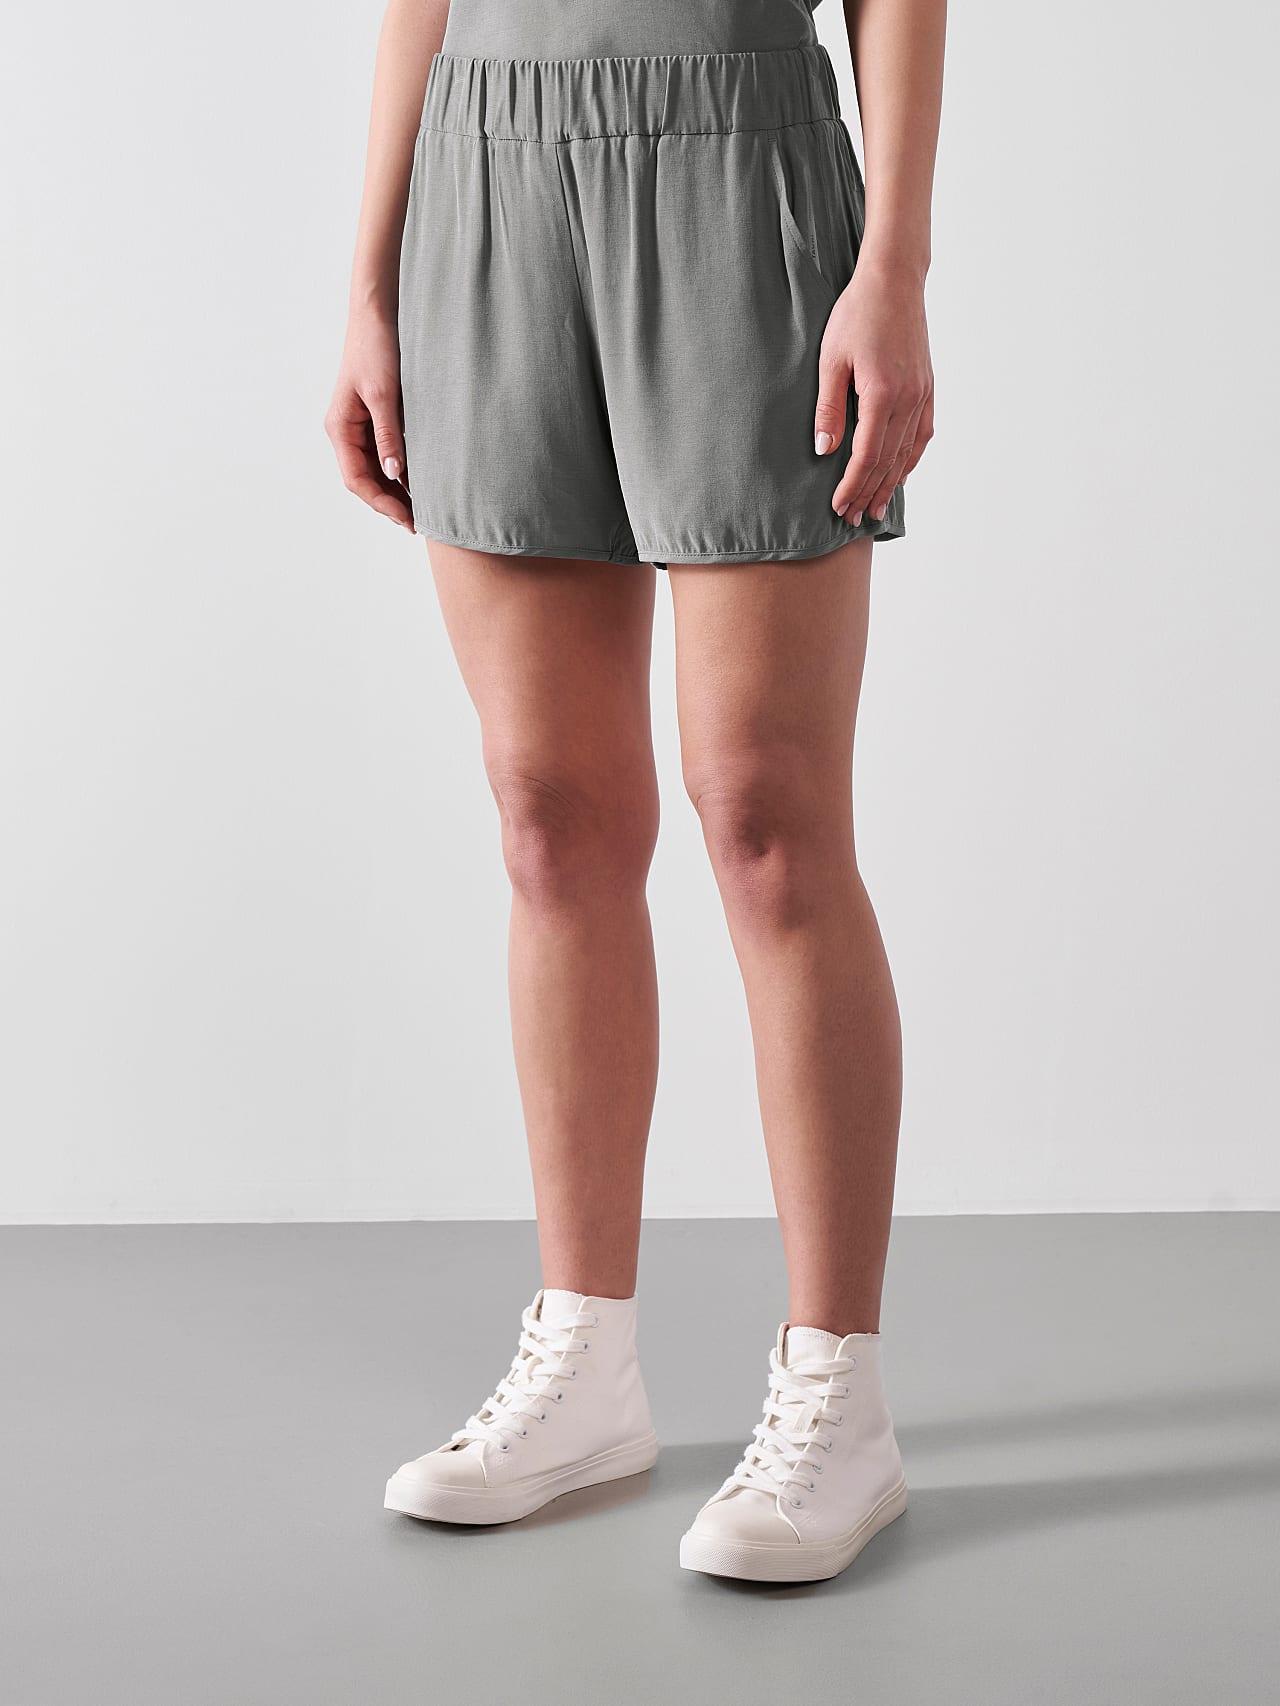 PHORT V1.Y5.01 Relaxed Cupro Shorts Grey Model shot Alpha Tauri